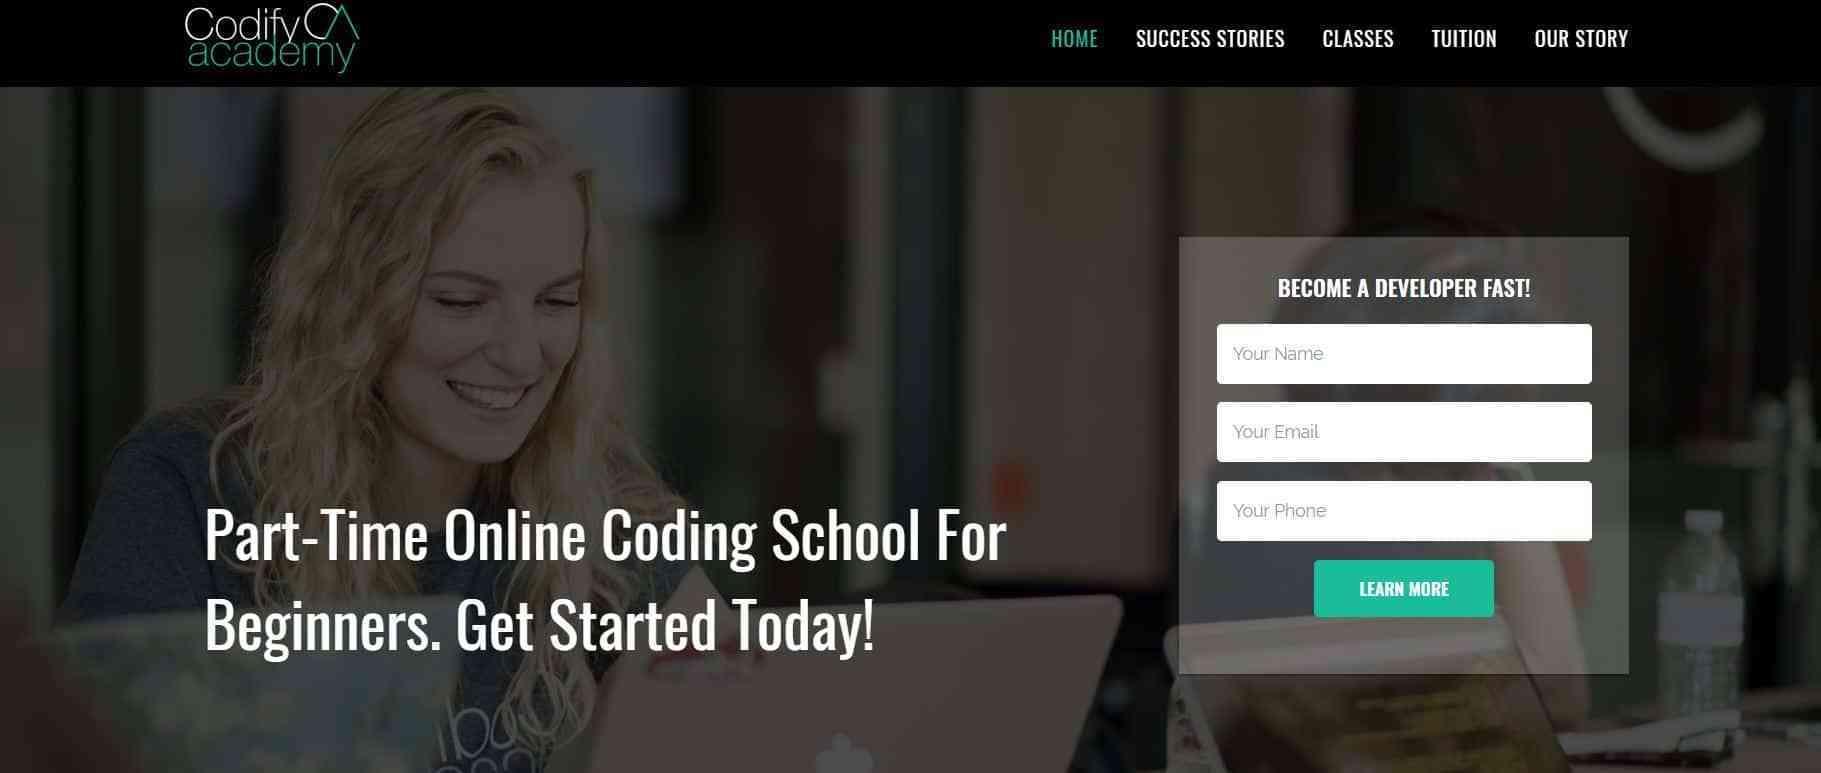 Codify Academy